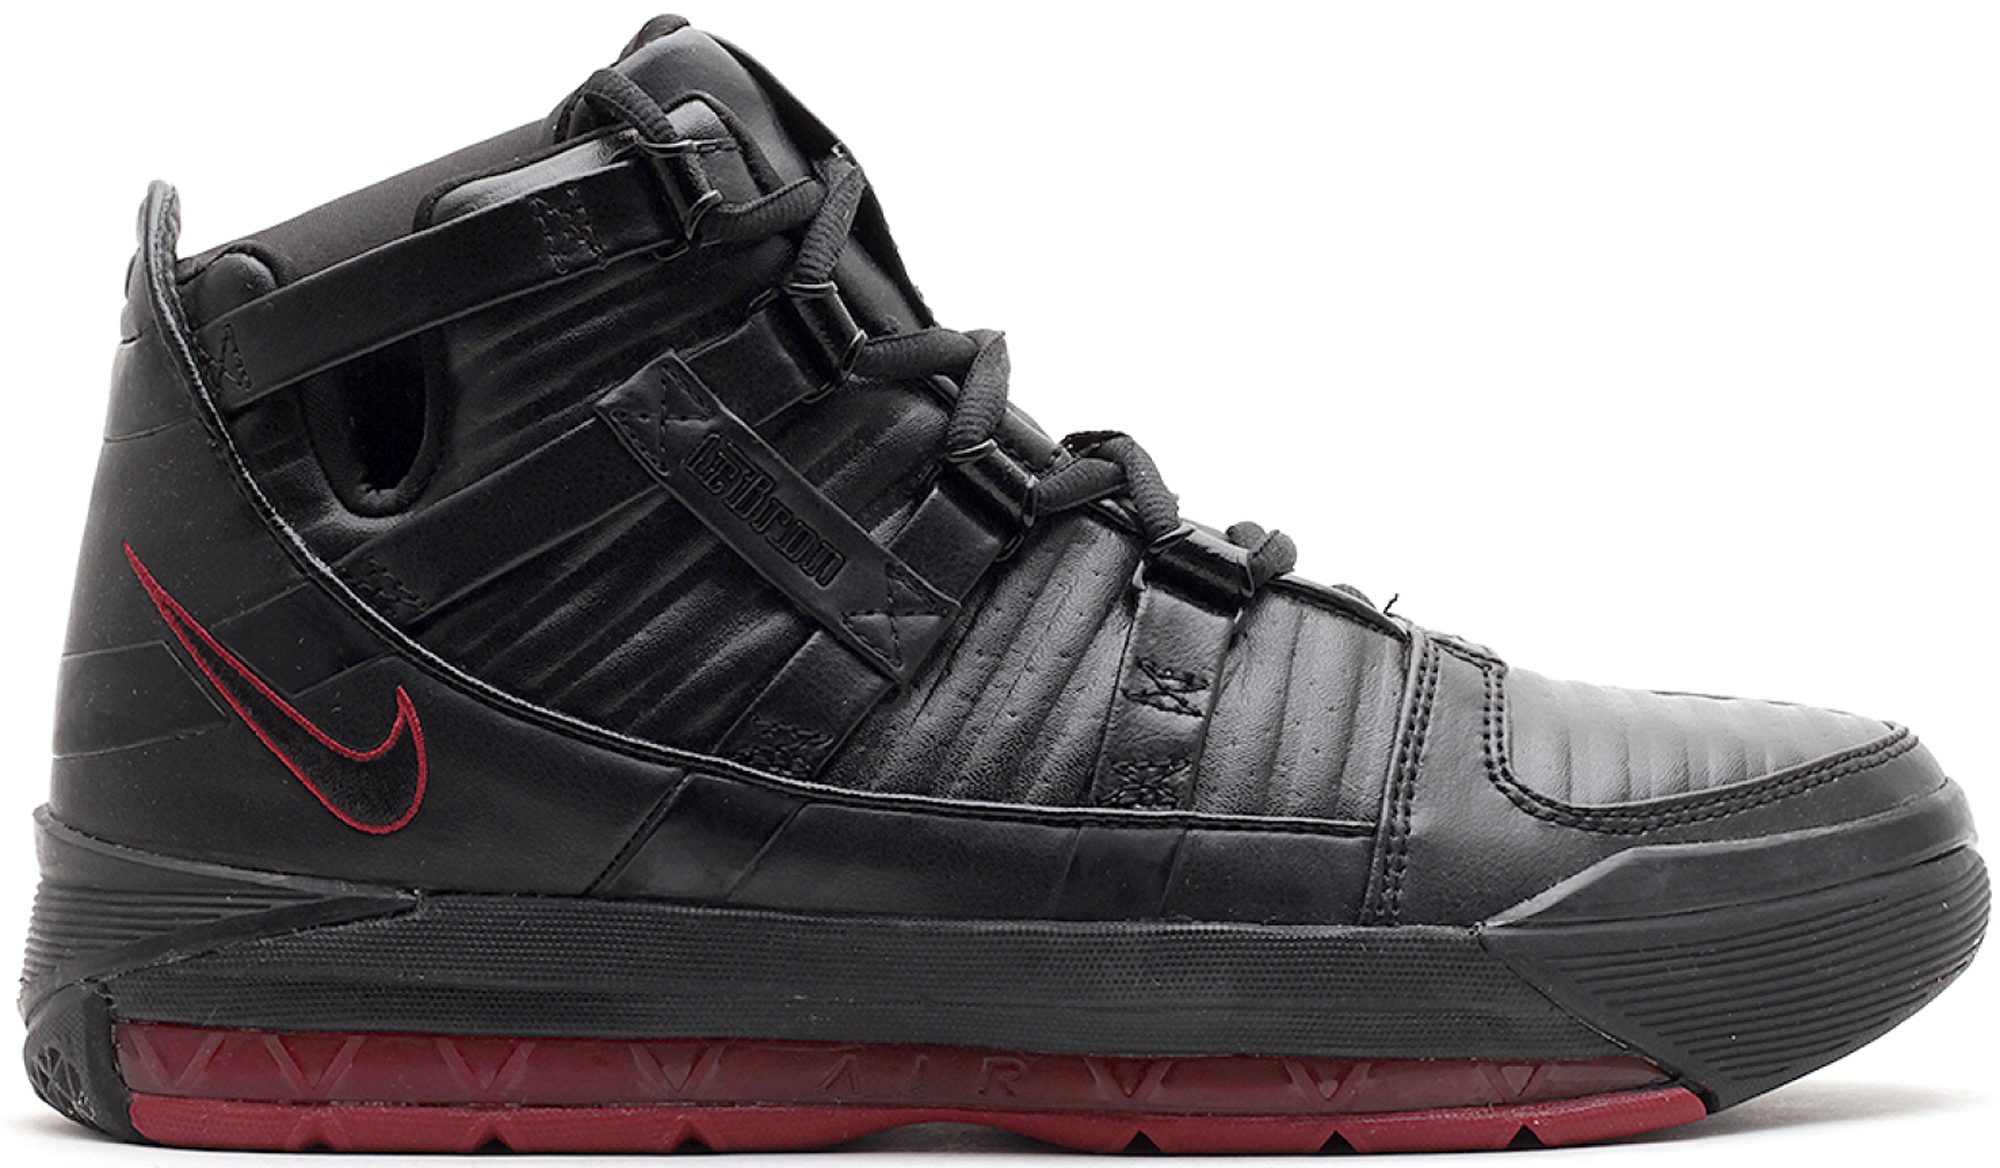 Nike LeBron 3 Black Crimson (GS